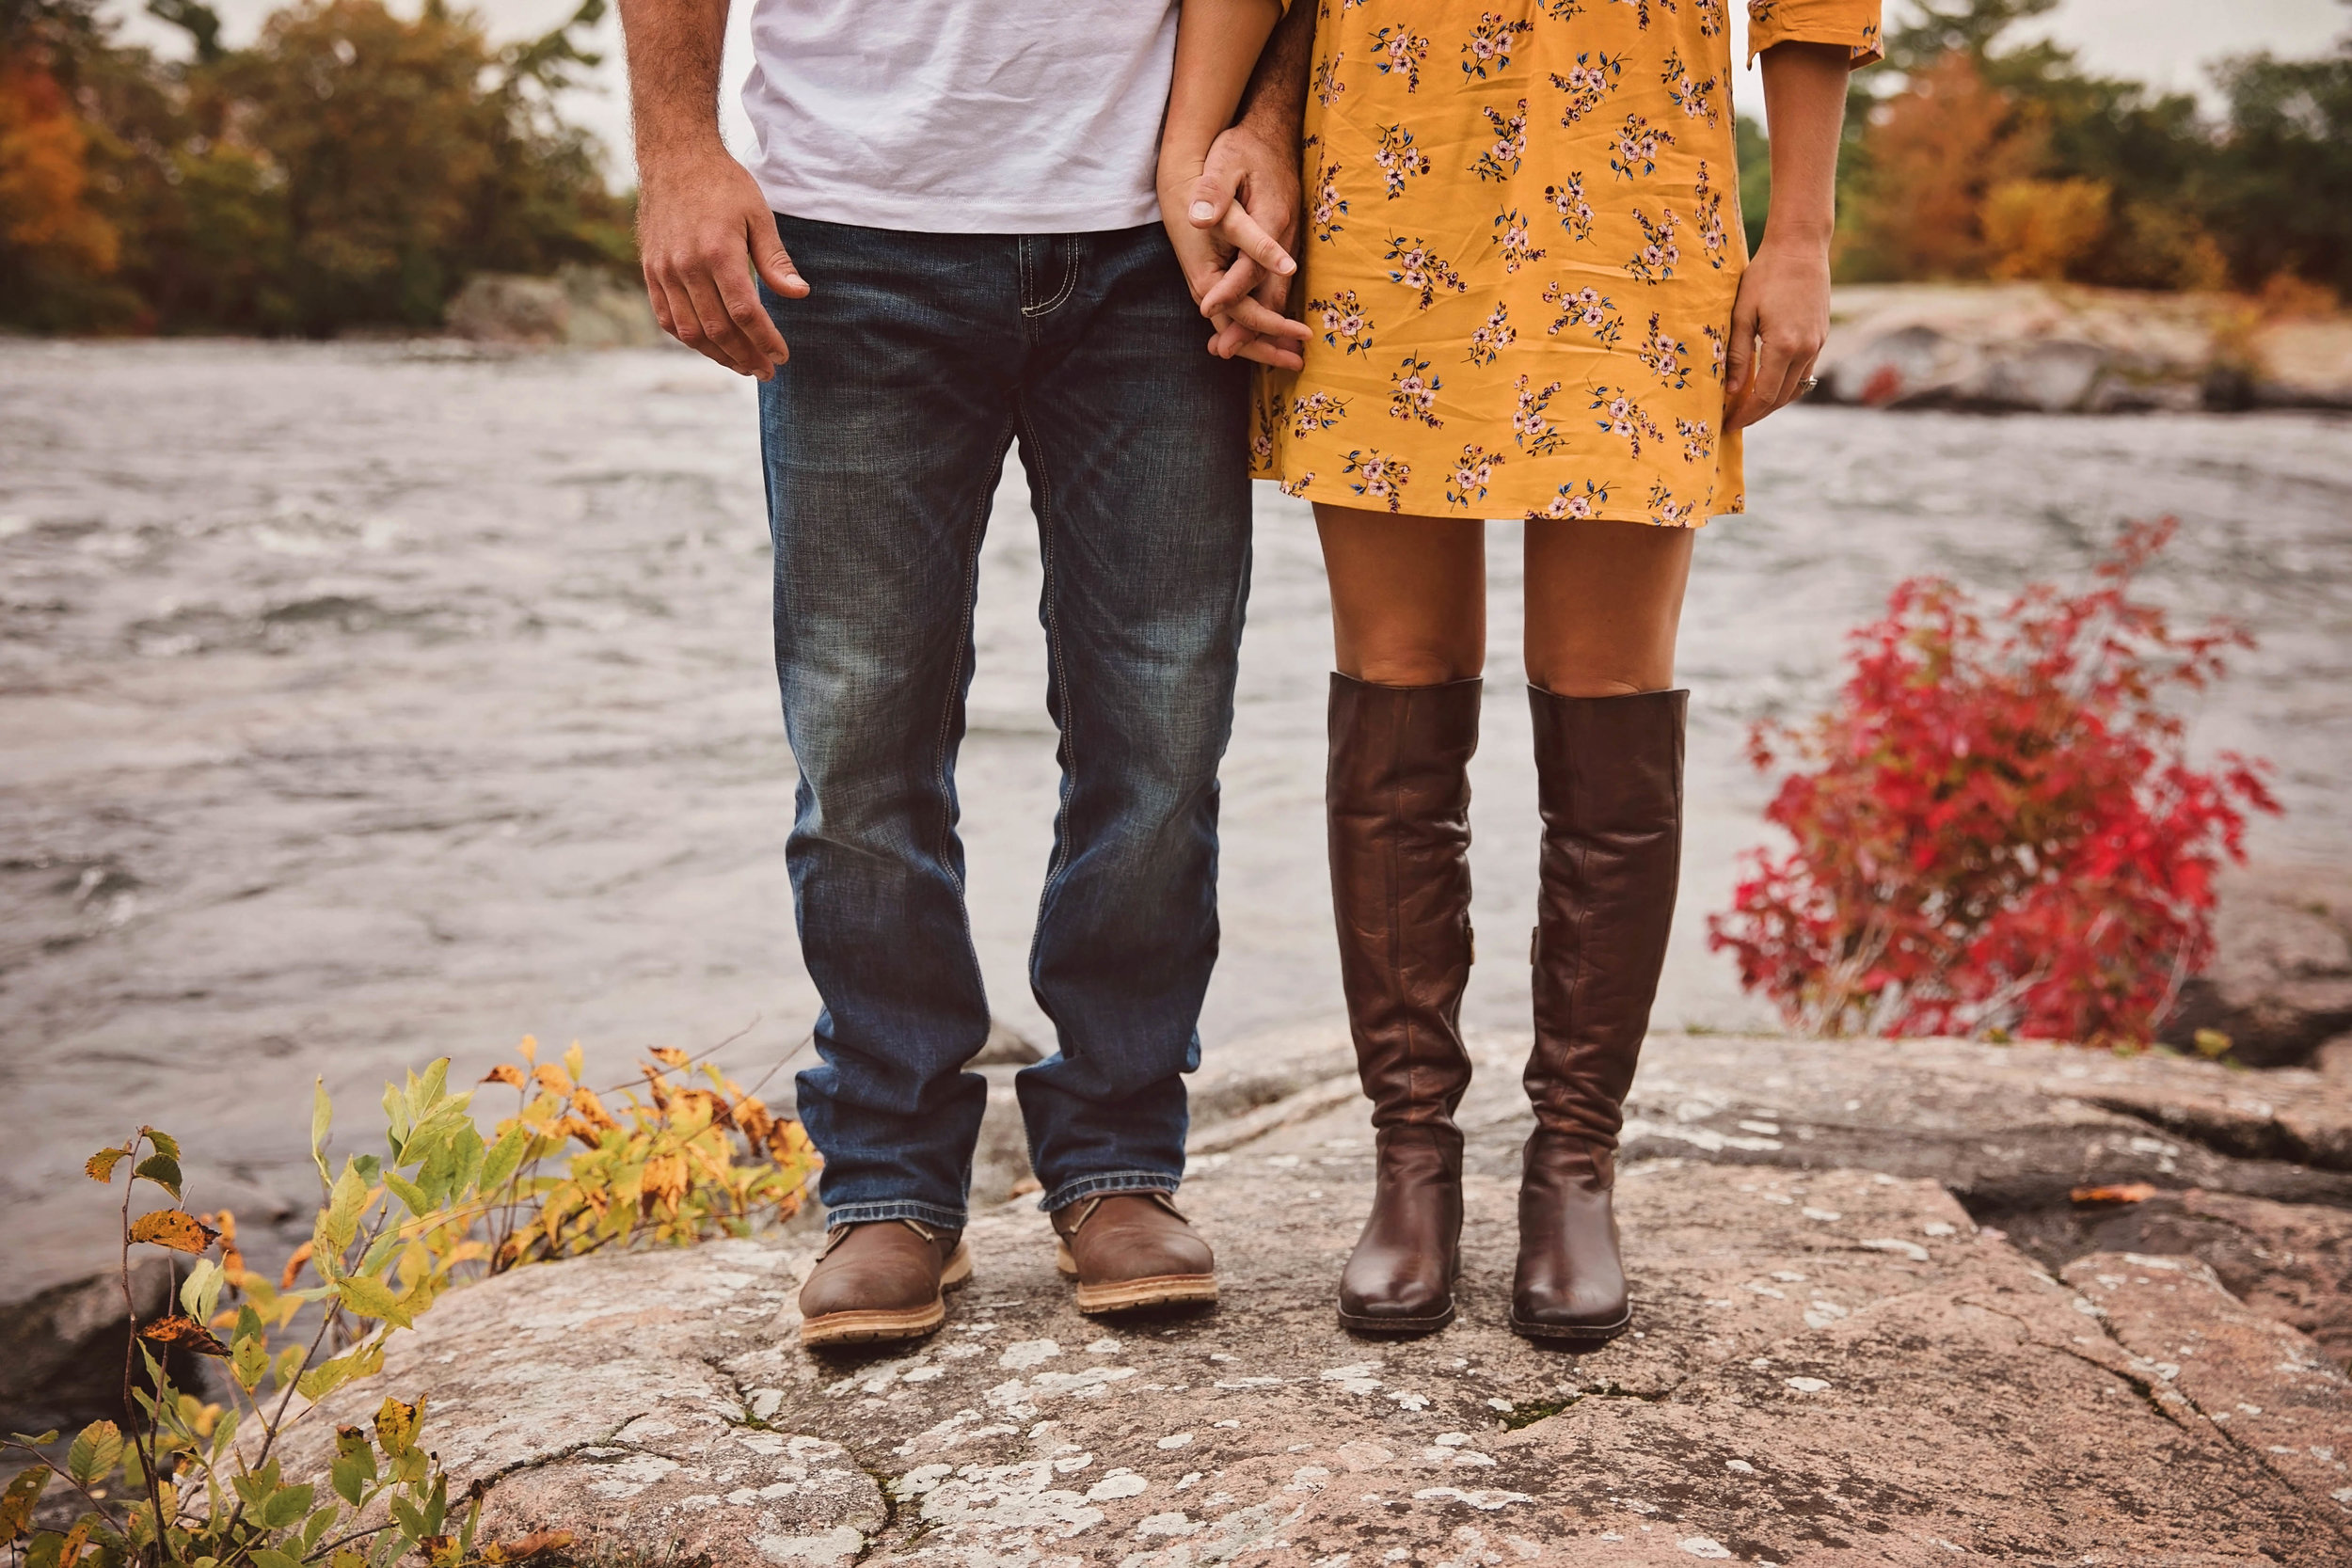 Morgan Bress Photography | Lindsay Wedding Photographer | Engagement Session with Dog | Kawartha Lakes Wedding Photographer | Ontario Wedding Photographer |  Burleigh Falls, Ontario | Bigleys Shoes | Waterfall Engagement